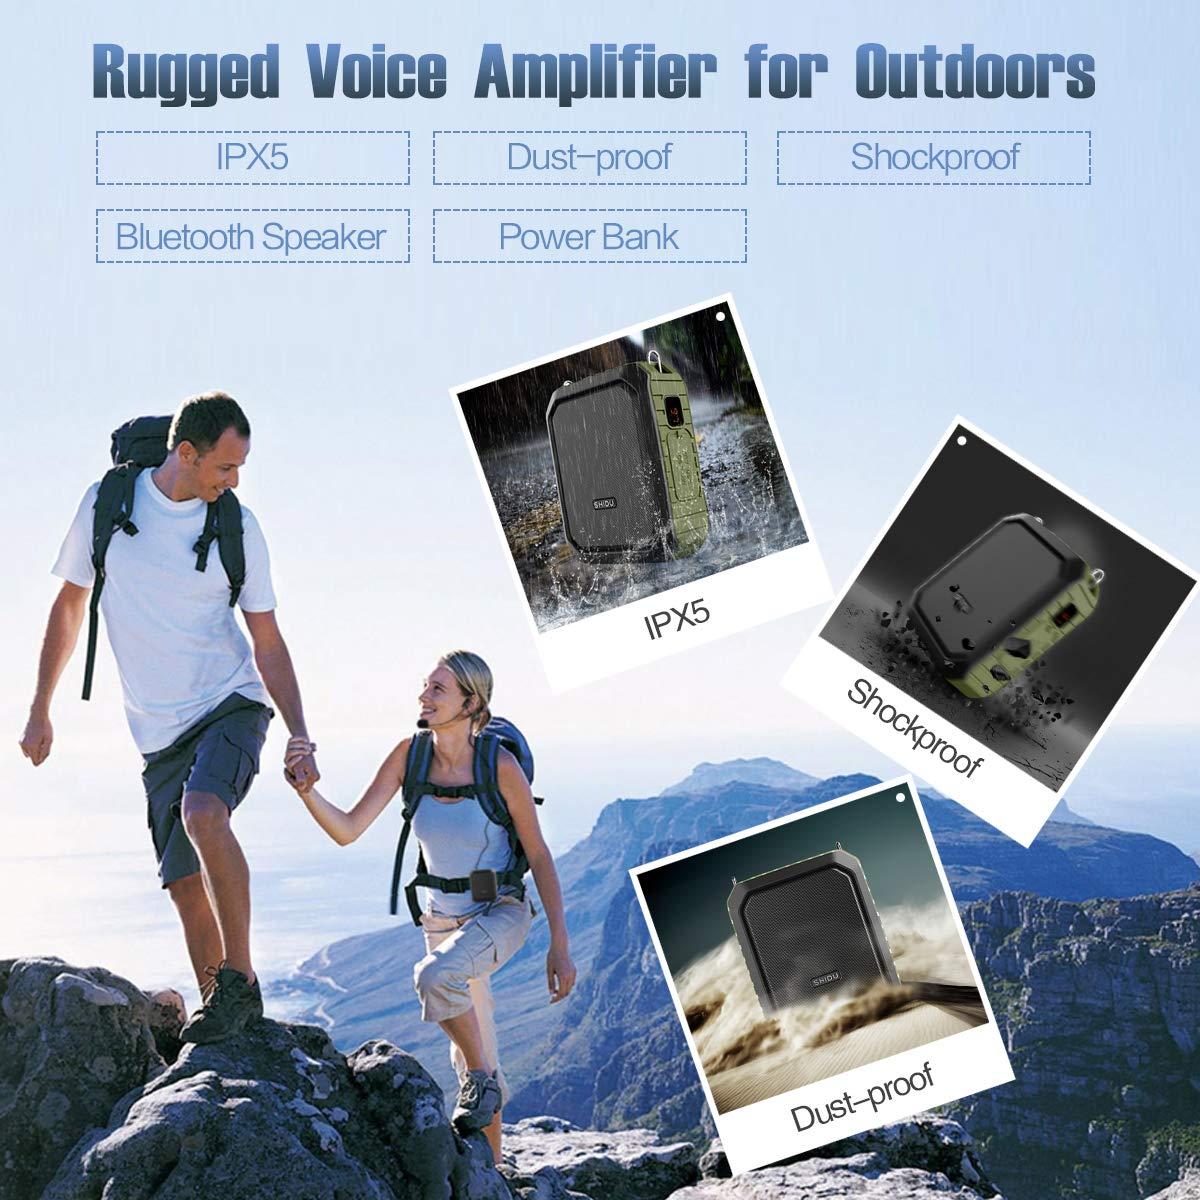 Winbridge Voice Amplifier With Microphone Headset Megaphone Clip Amp Loop September Powerbank Slim 80000mah Portable Bluetooth Speaker Power Bank Waterproof Ipx5 For Outdoors Activities